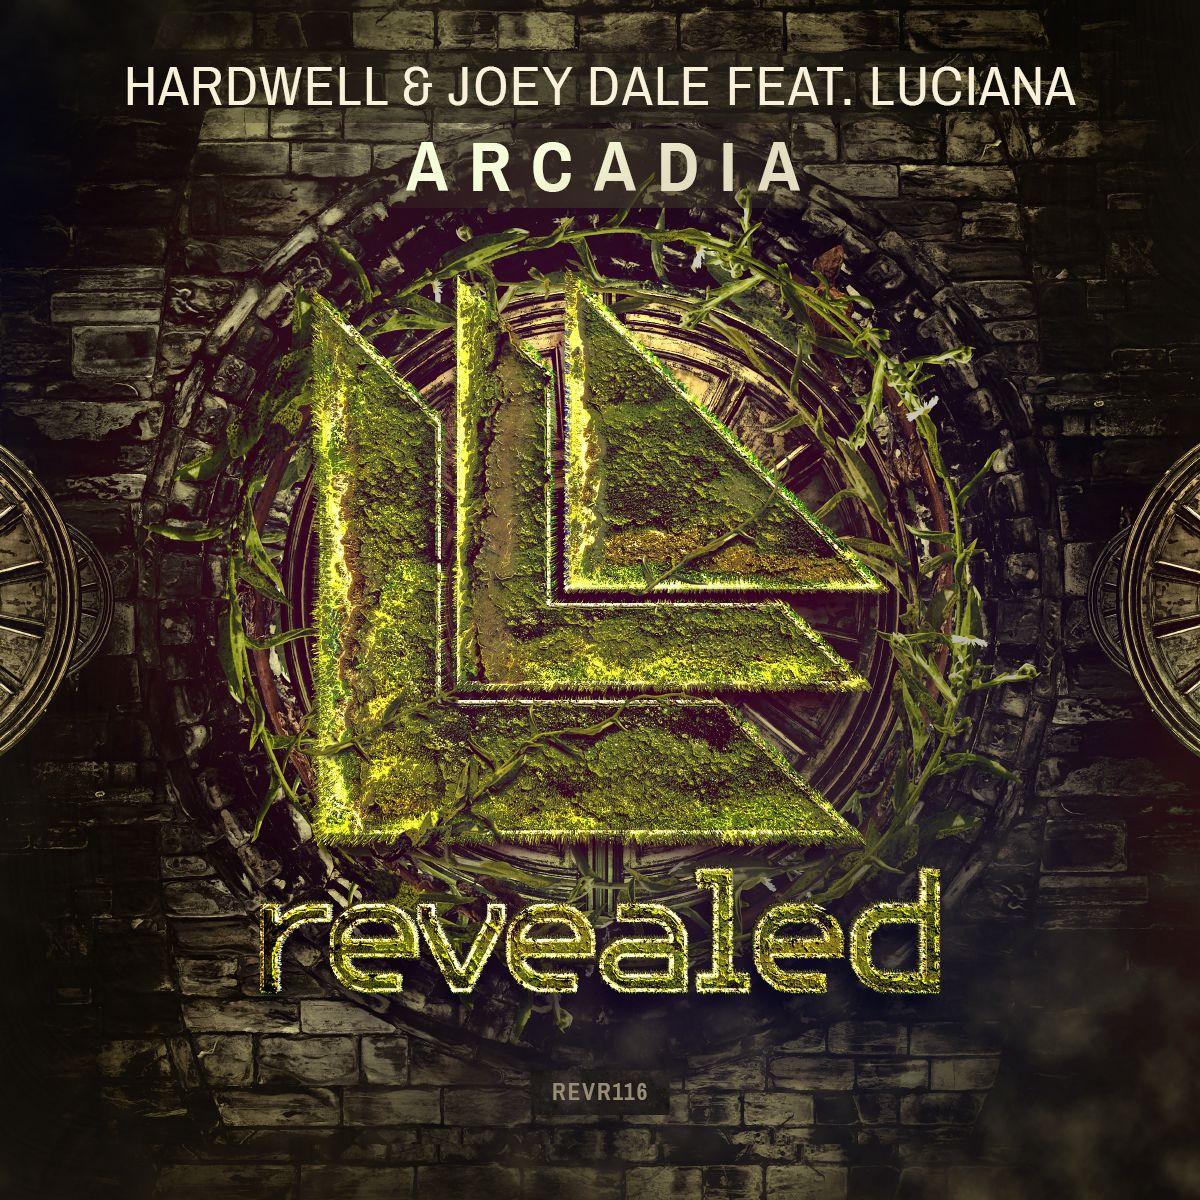 Hardwell, Joey Dale, Luciana – Arcadia (single cover art)